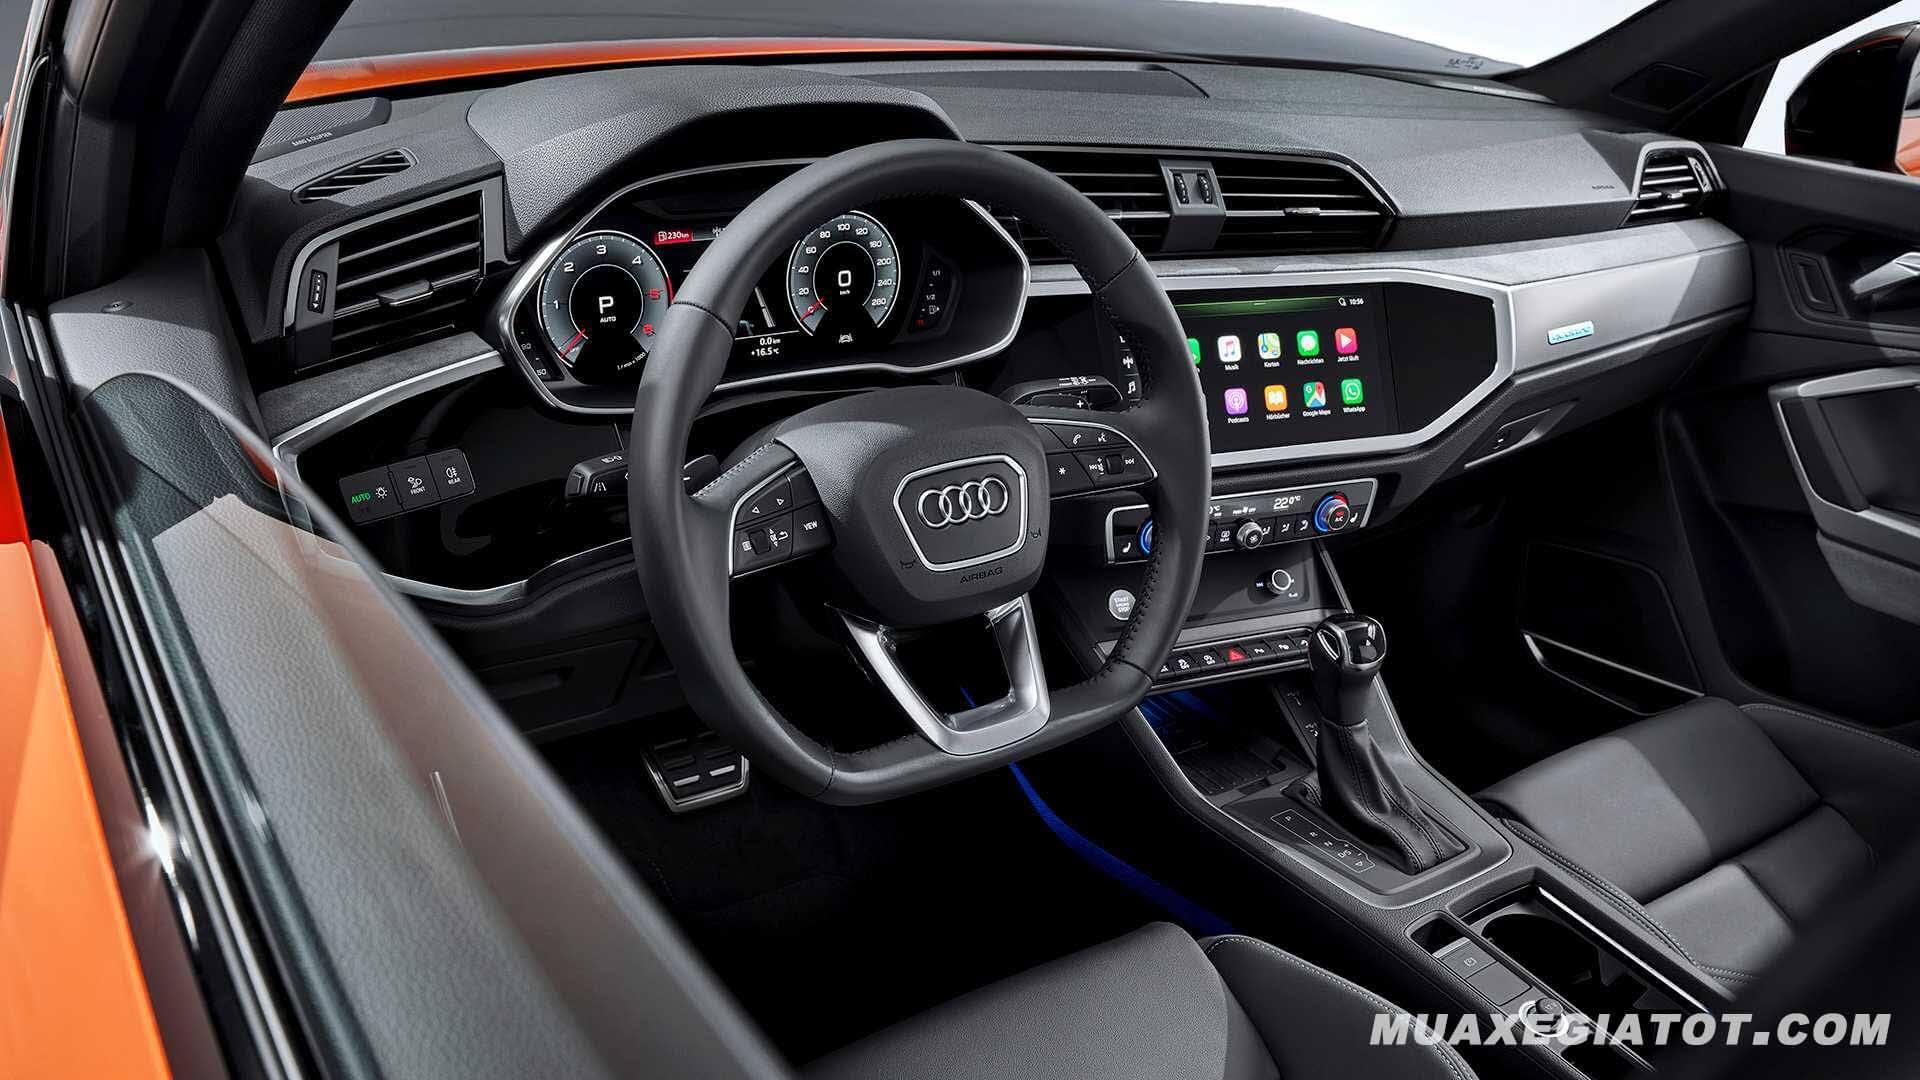 noi-that-xe-audi-q3-sportback-2020-muaxegiatot-com